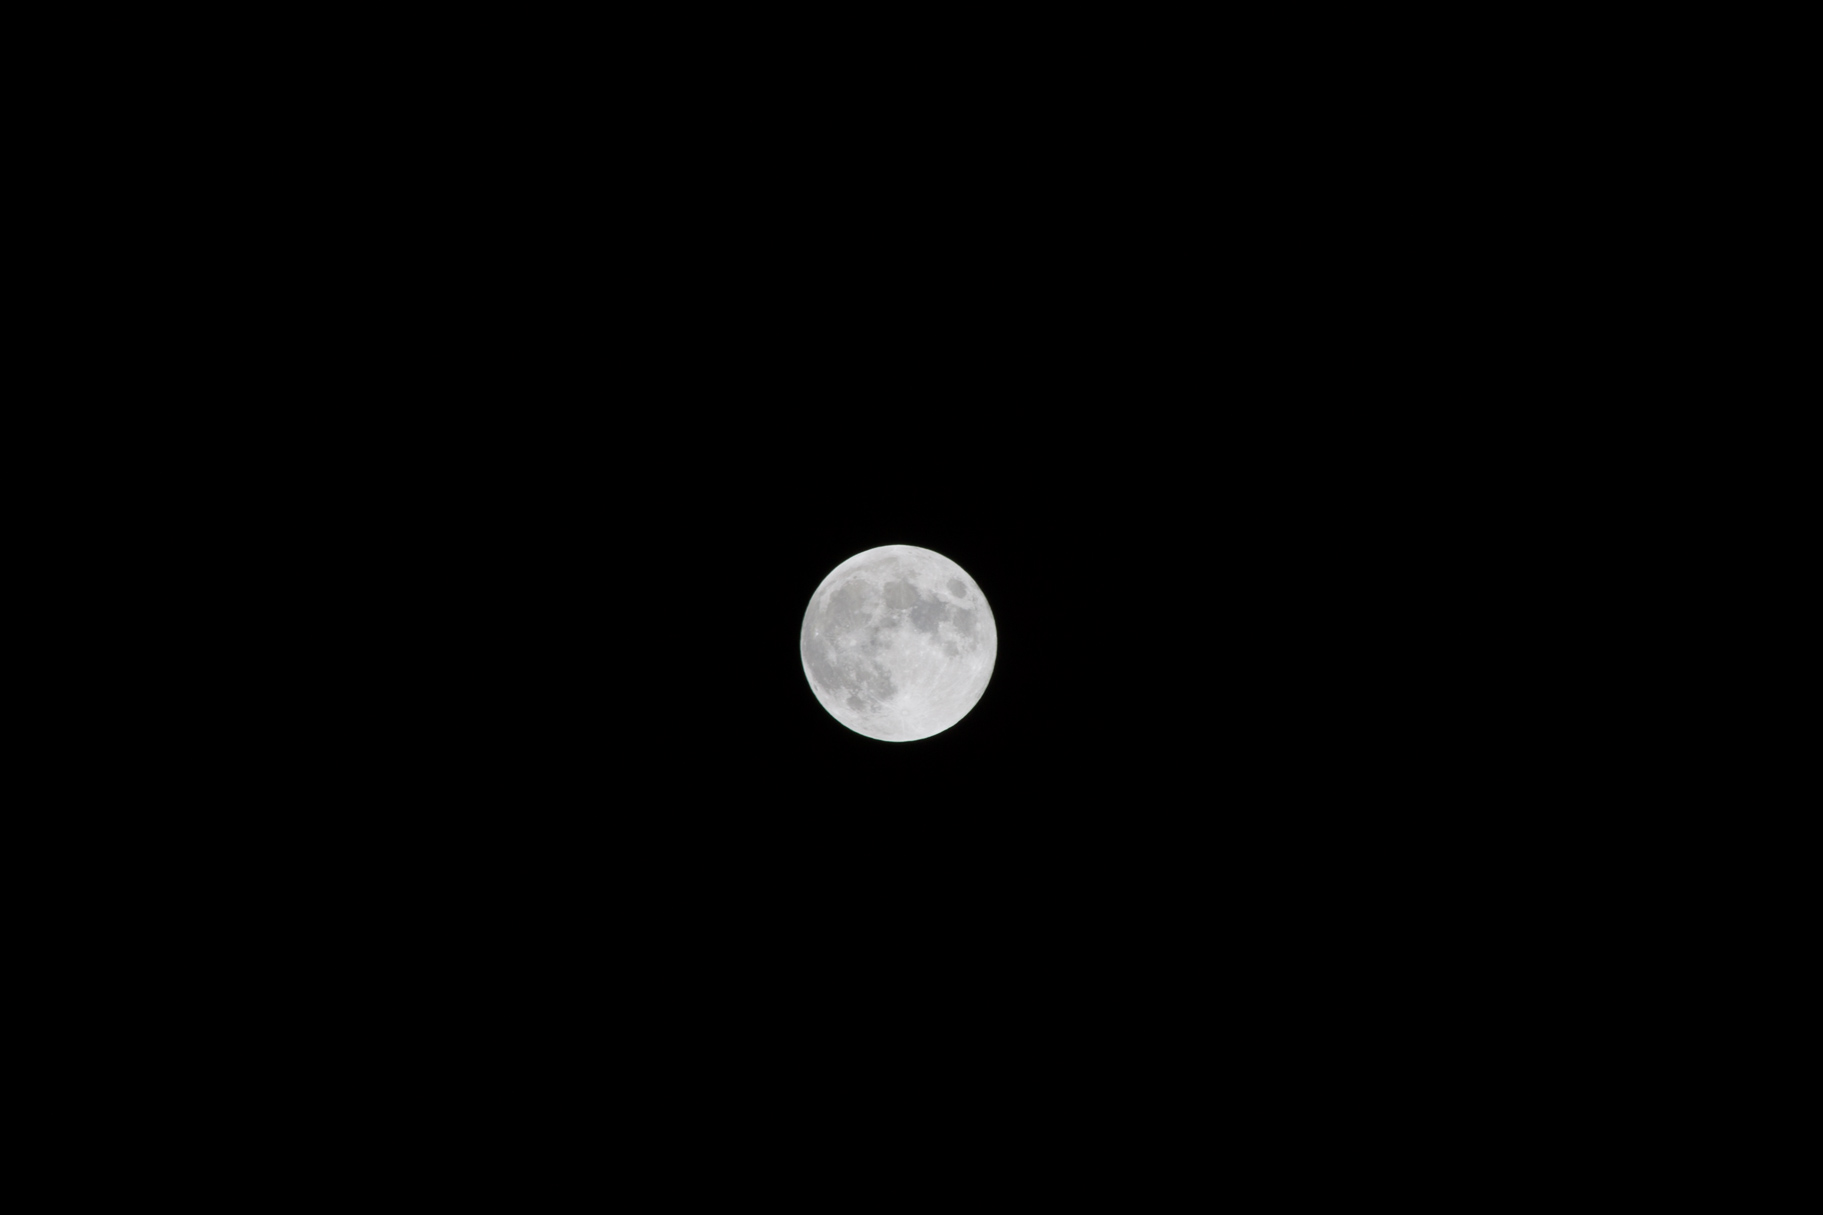 Lunar Eclipse Oct 18, 2013